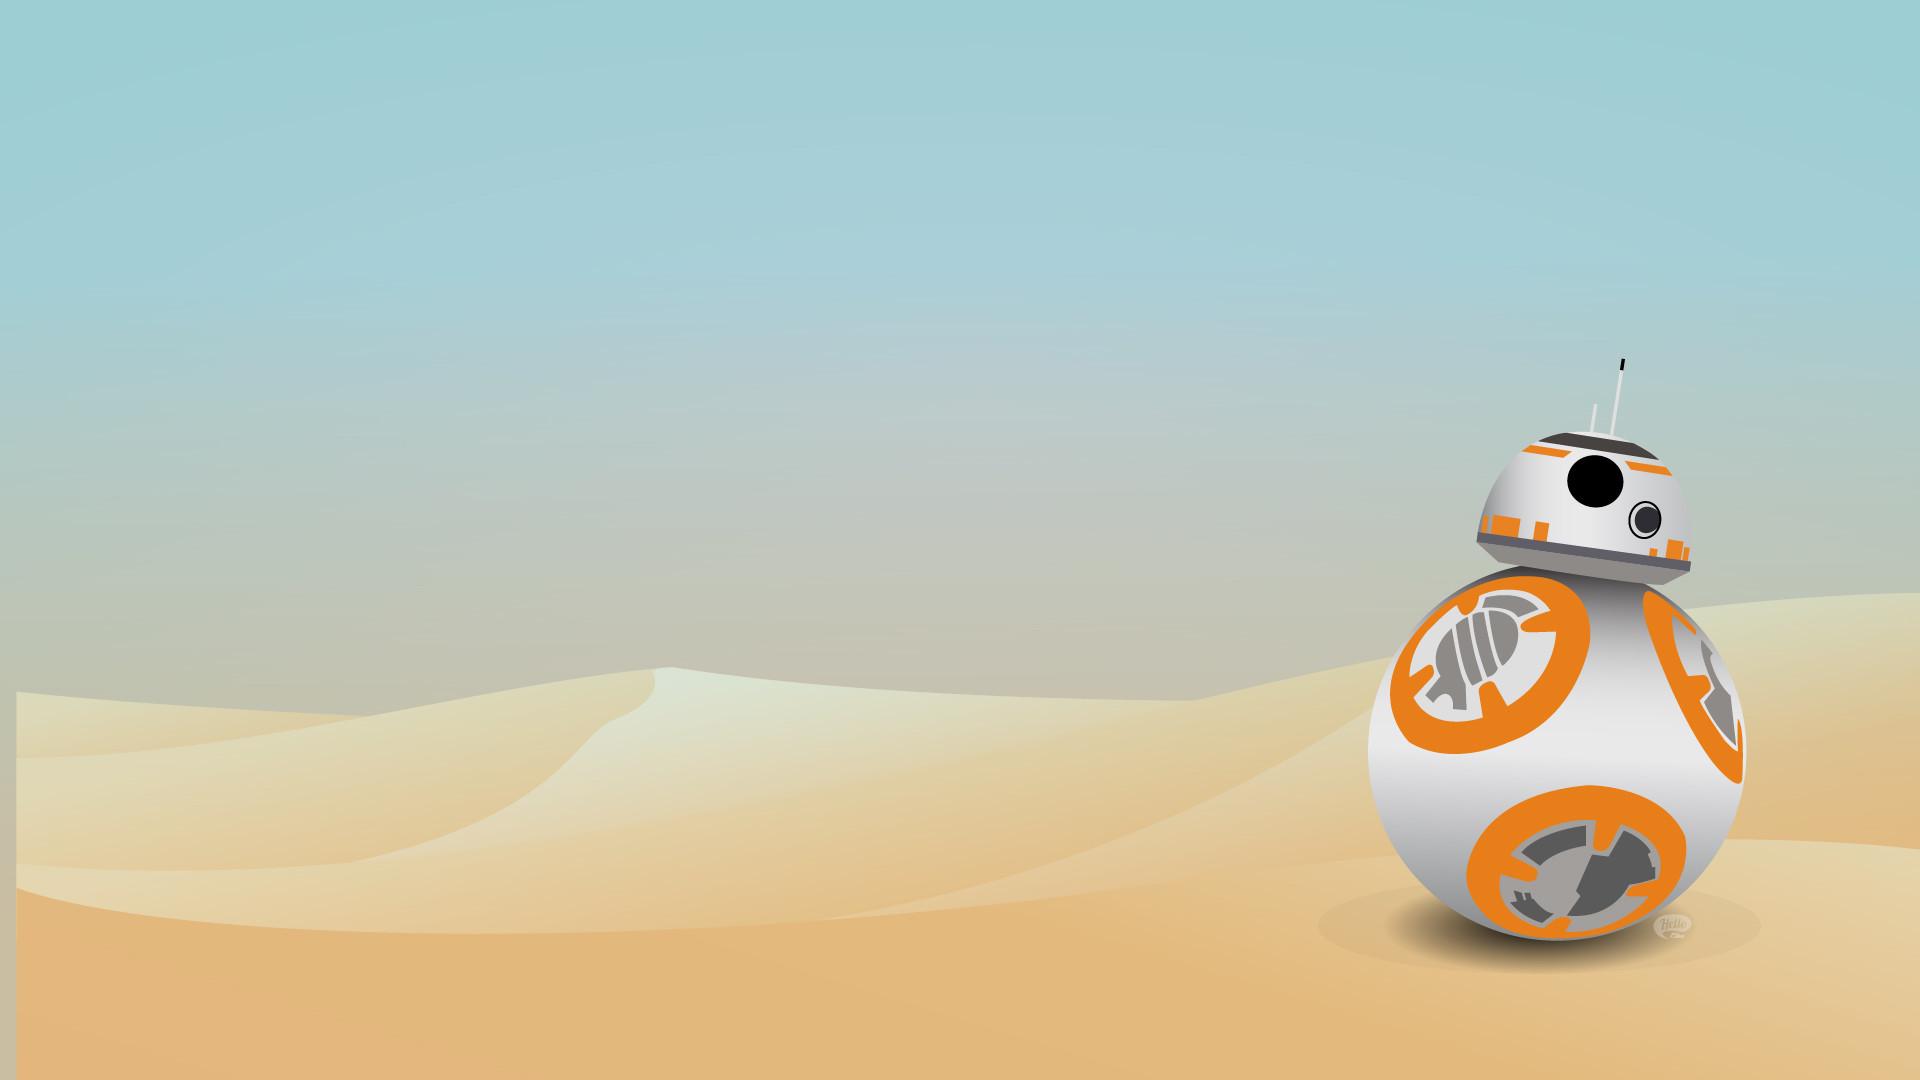 Star Wars Iphone Wallpaper Bb8 Erg 1920x1080 Wallpaper Teahub Io